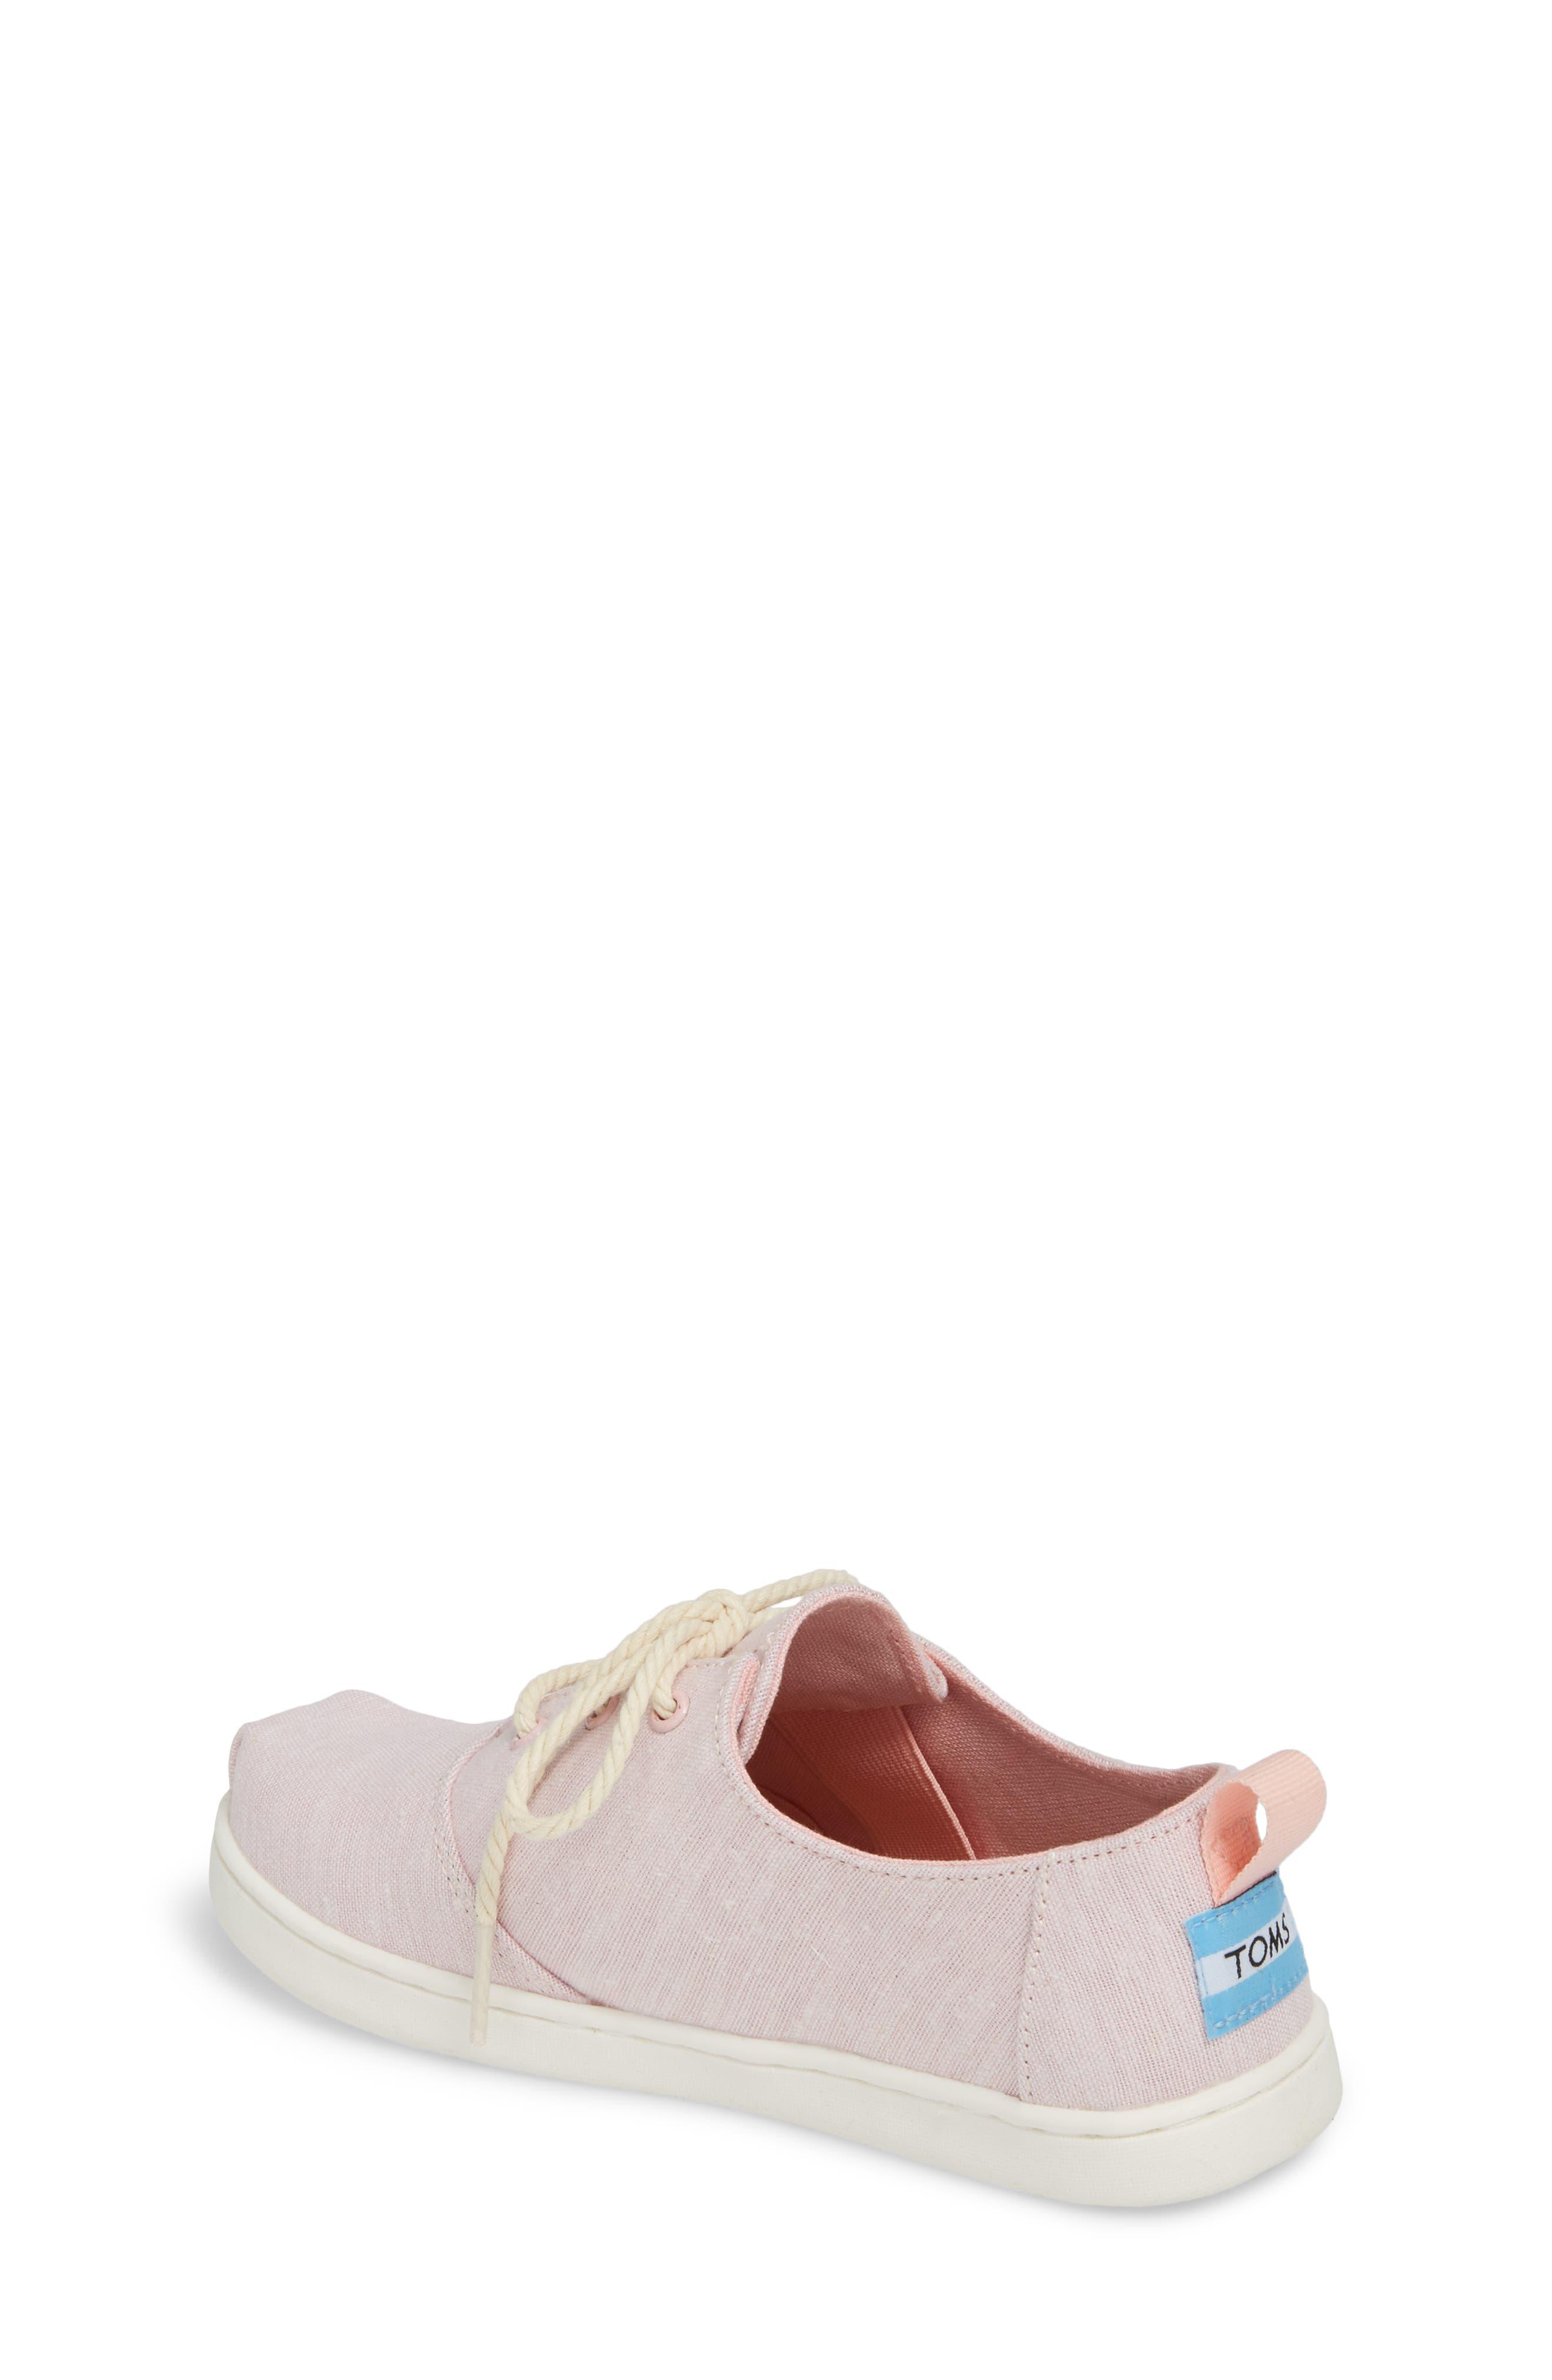 Lumin Sneaker,                             Alternate thumbnail 2, color,                             650